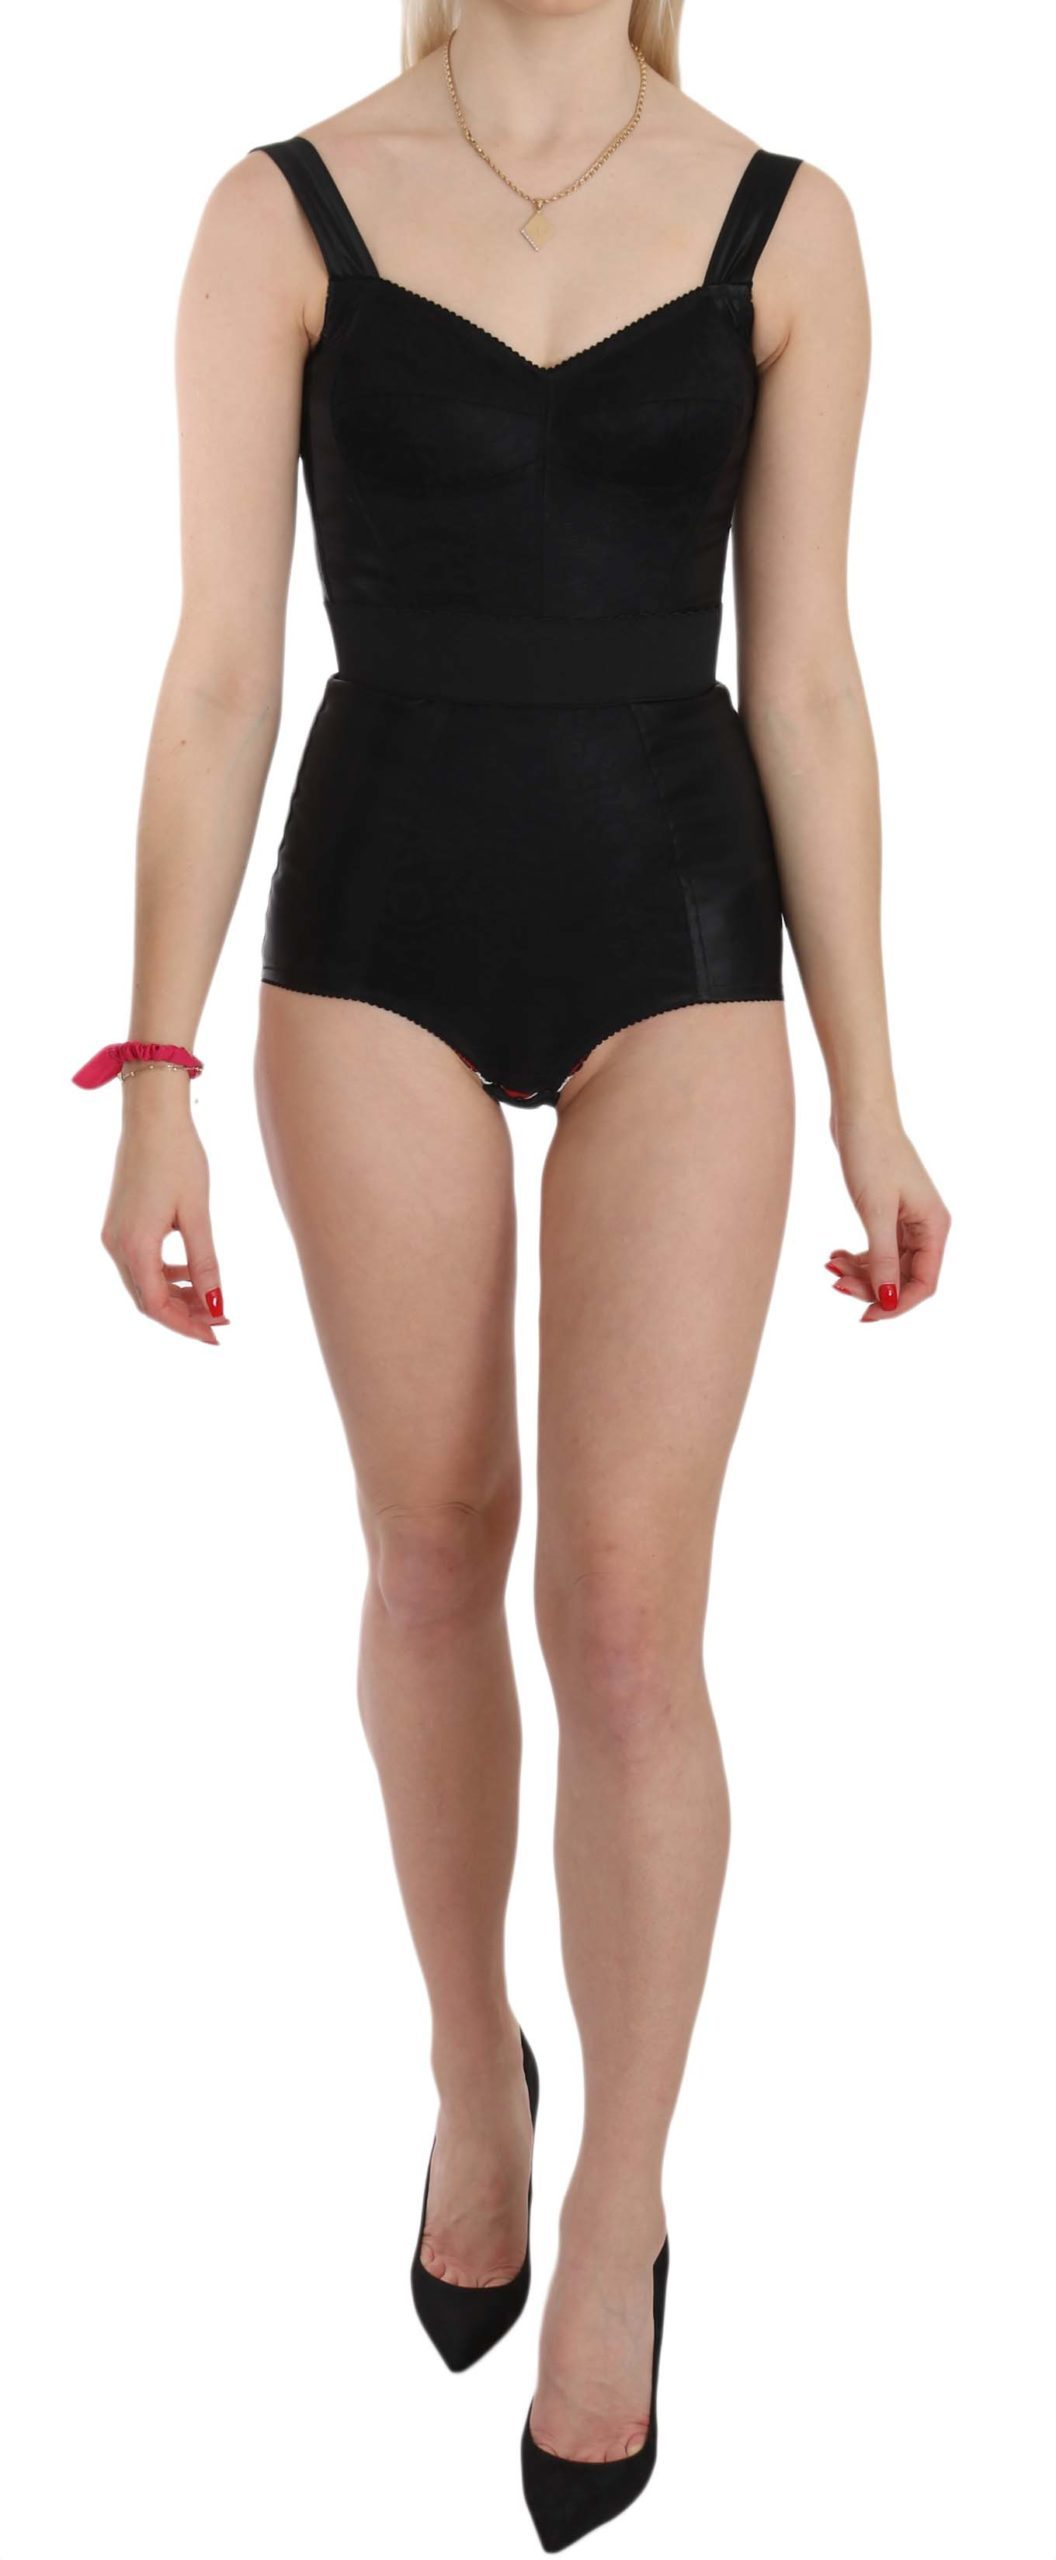 Dolce & Gabbana Women's Romper Stretch Dress Black BIK104 - IT36 | XS